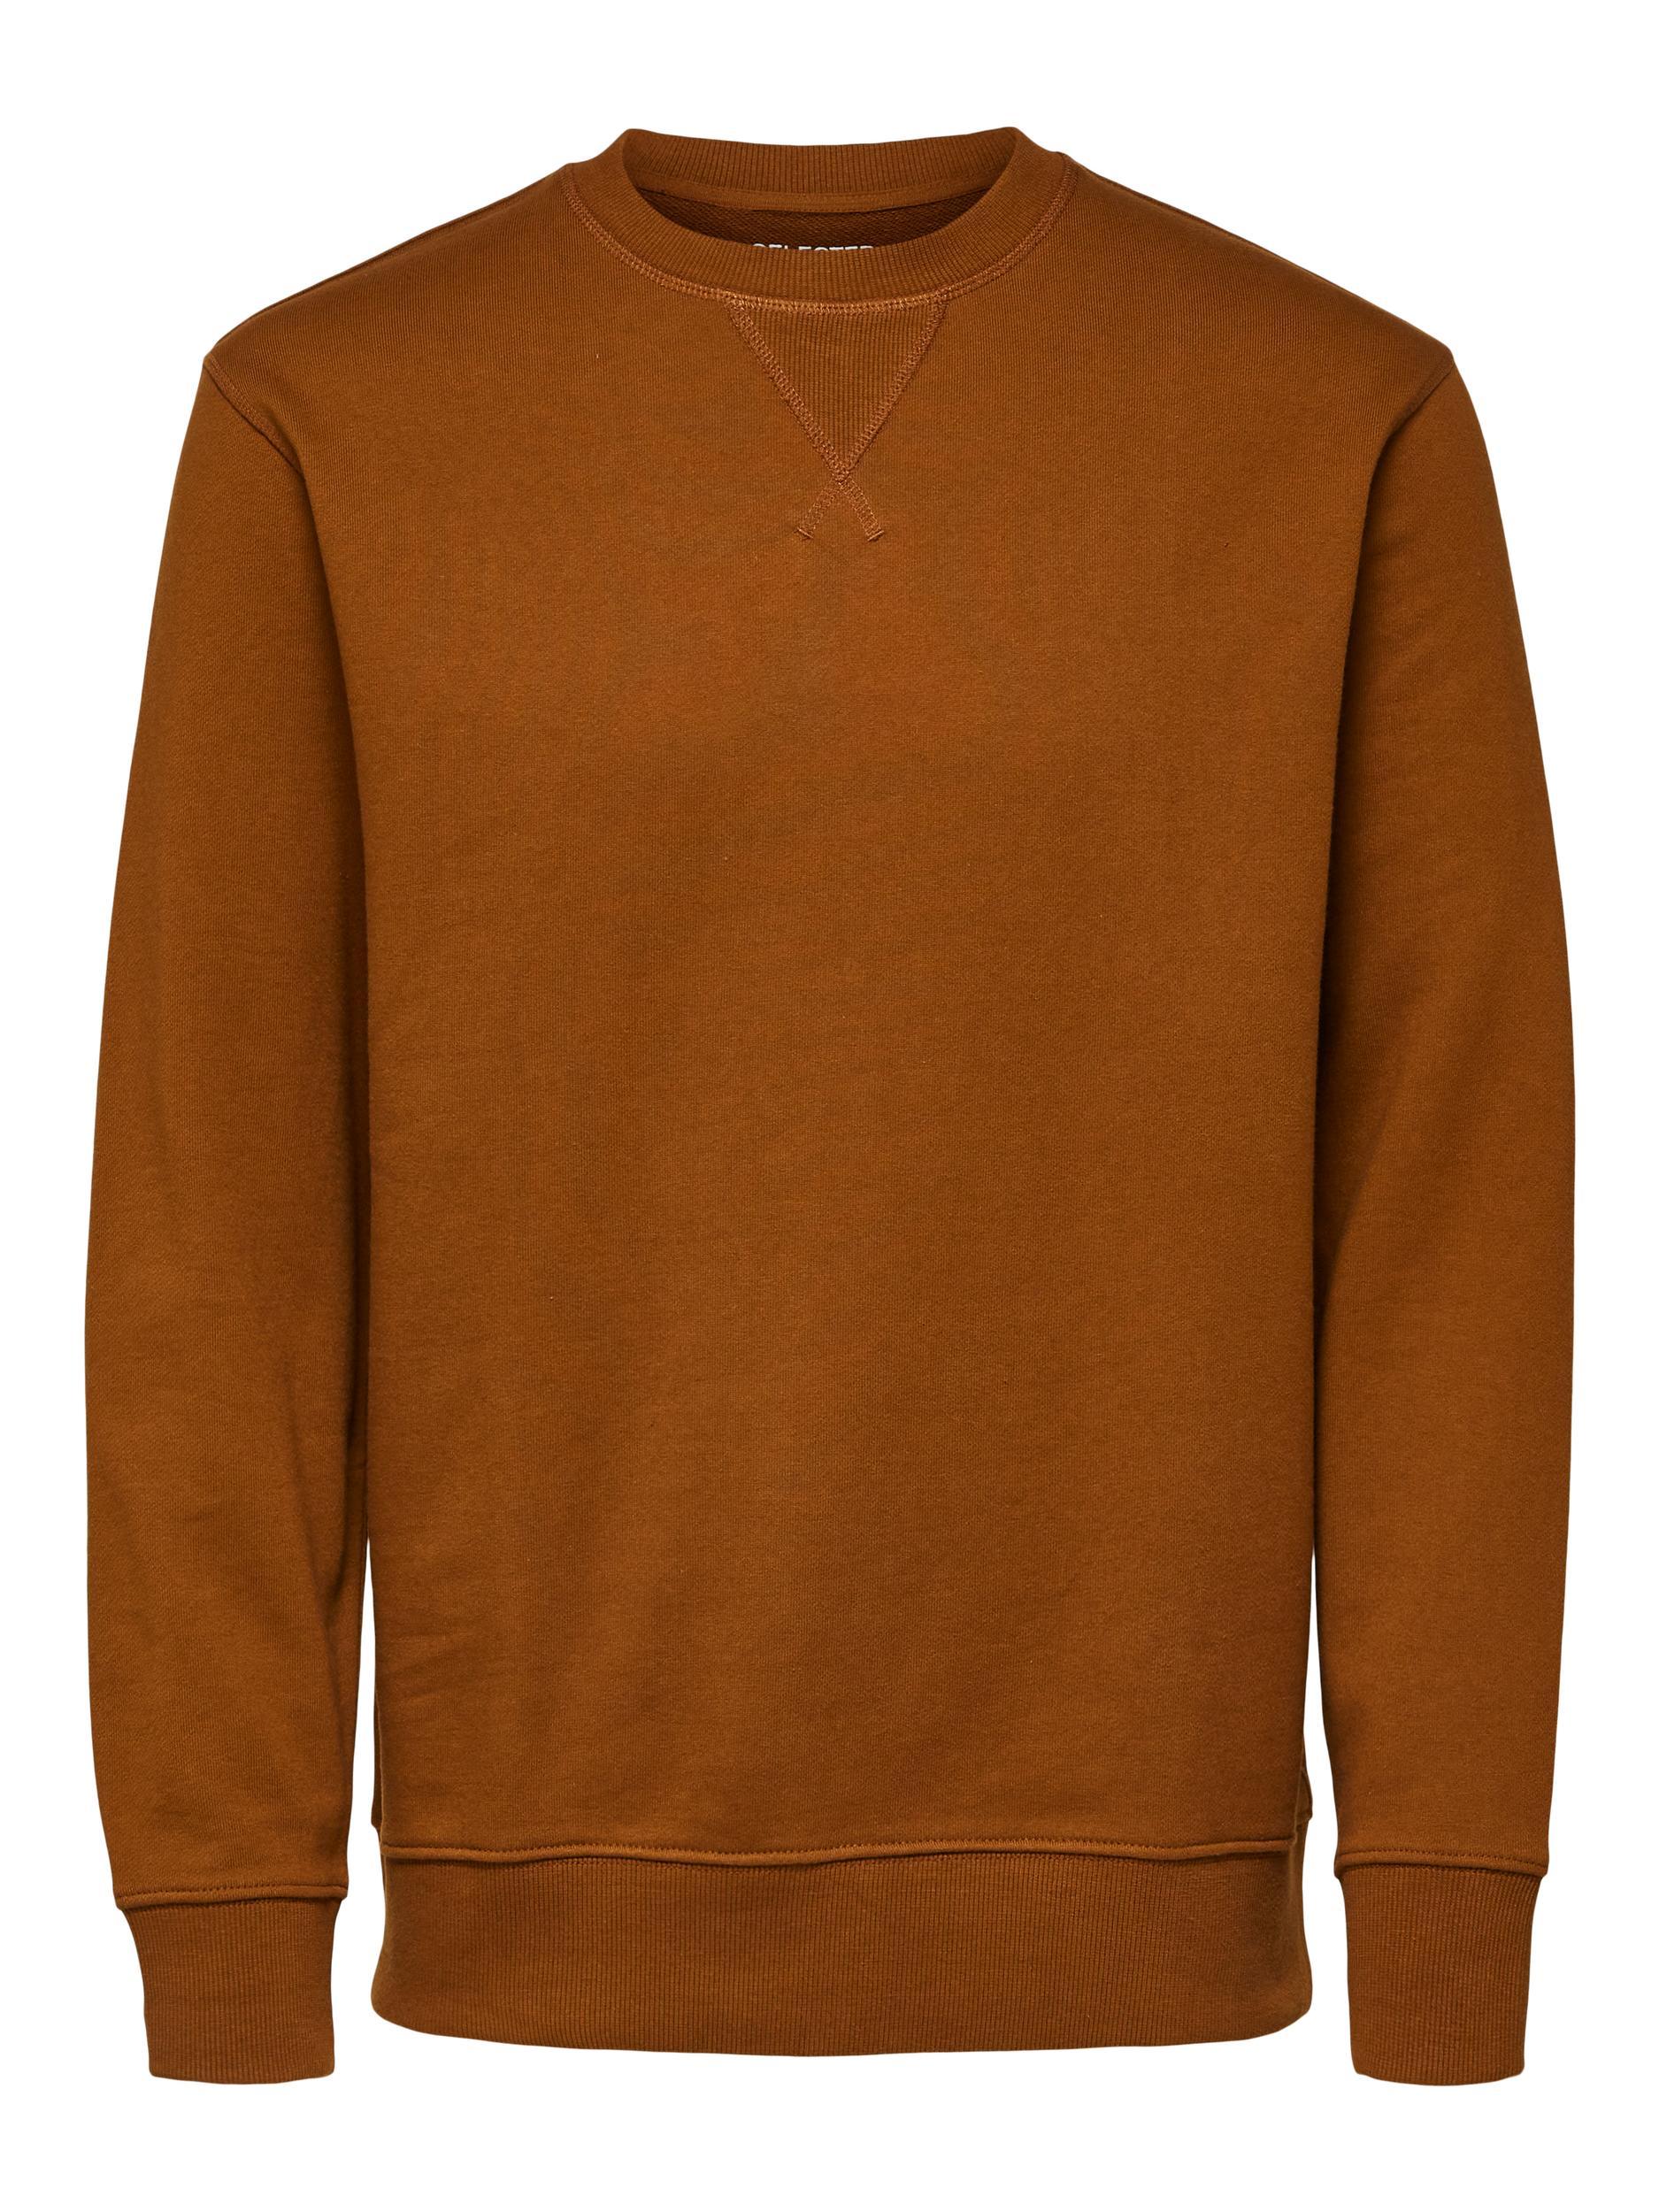 Selected Homme Jason Crew Neck sweatshirt